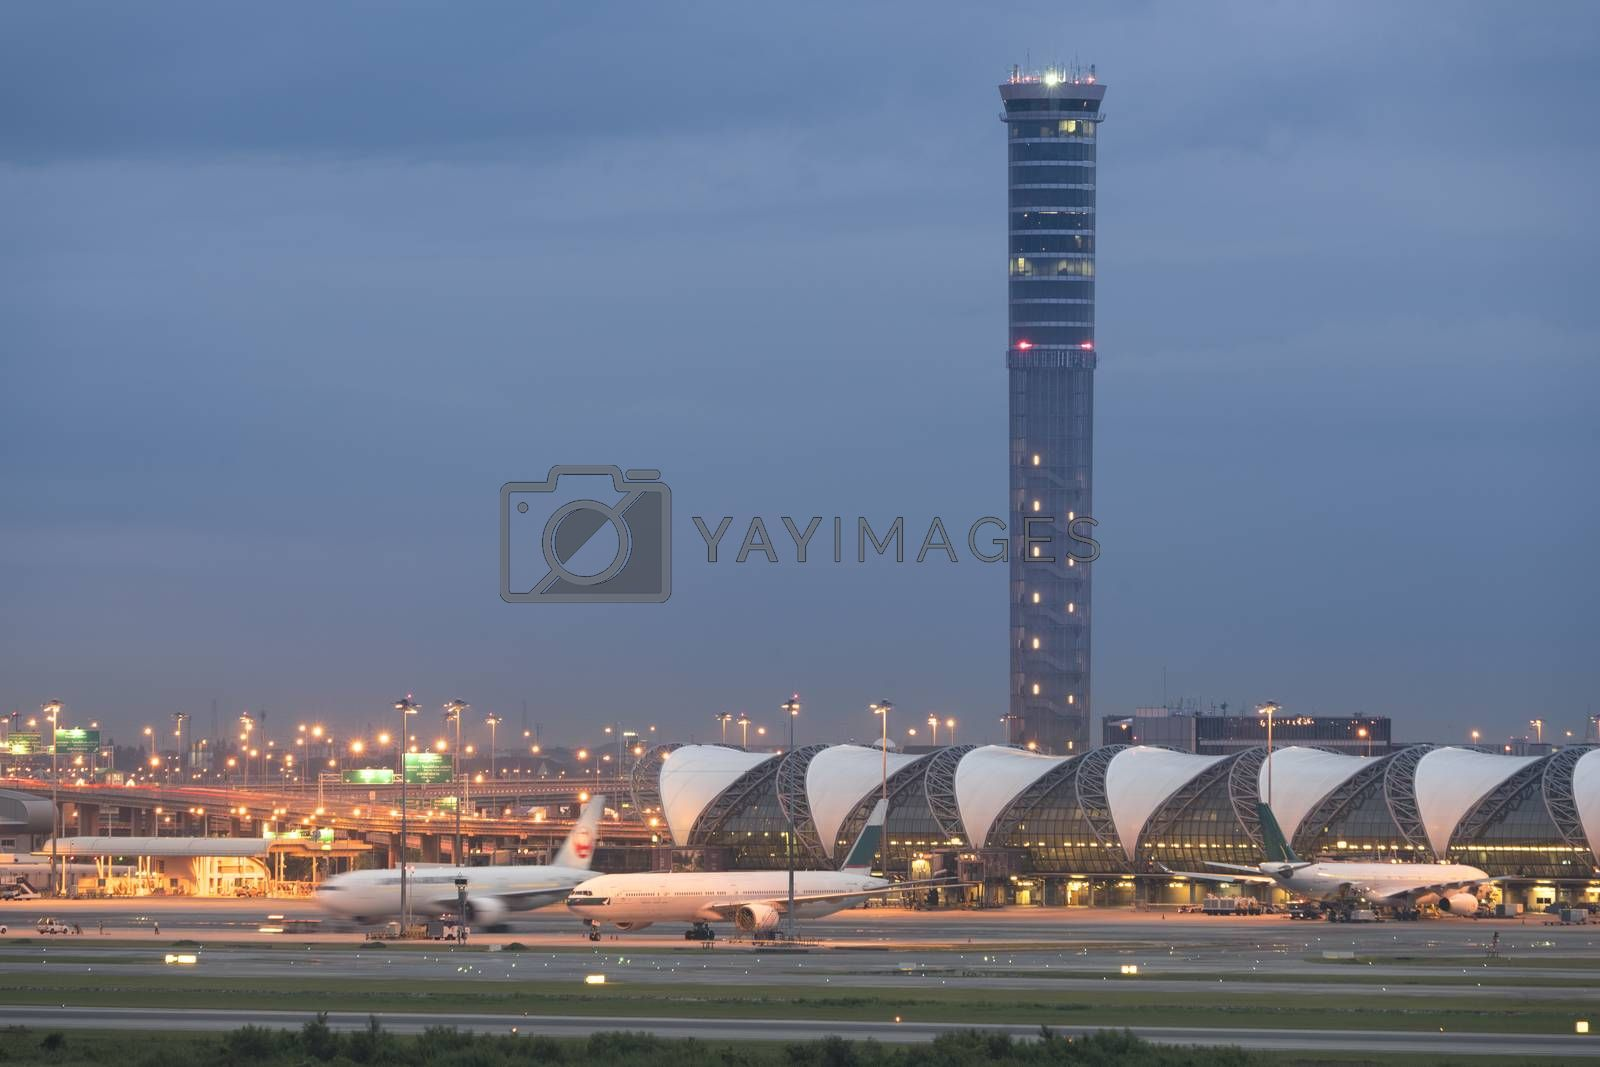 On 22 October 2017 Suvarnabhumi Airport two international airports serving Bangkok, Thailand